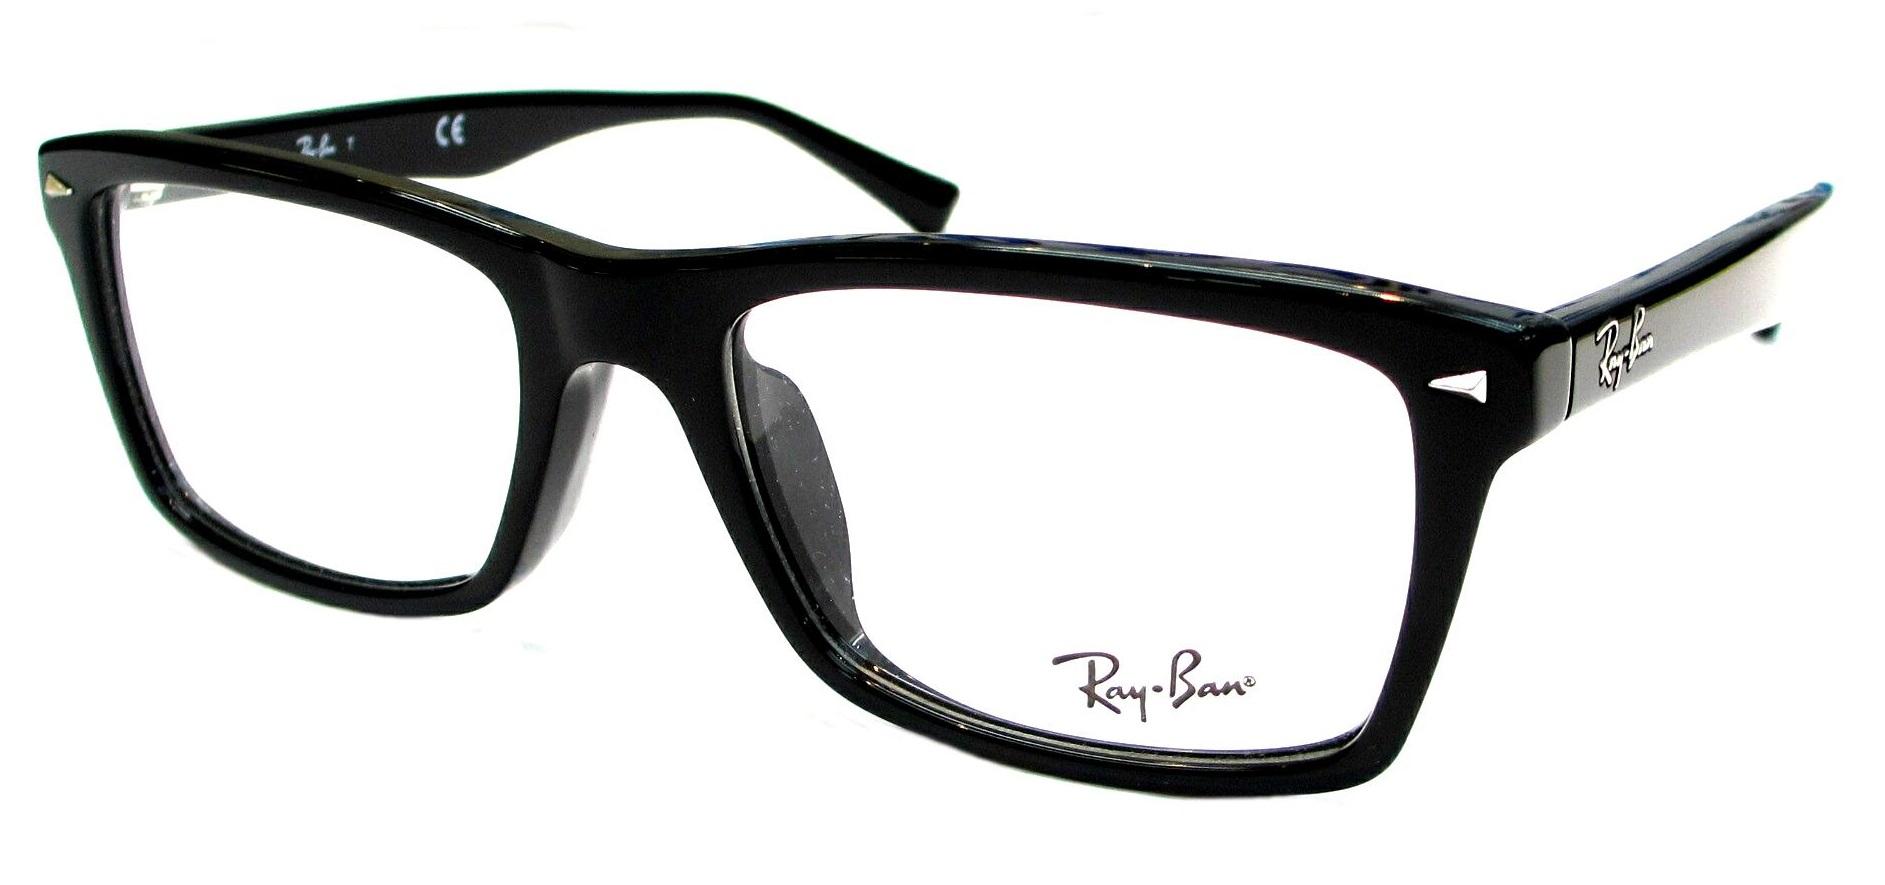 Ray Ban Rx5254 54 2000 www.panaust.com.au